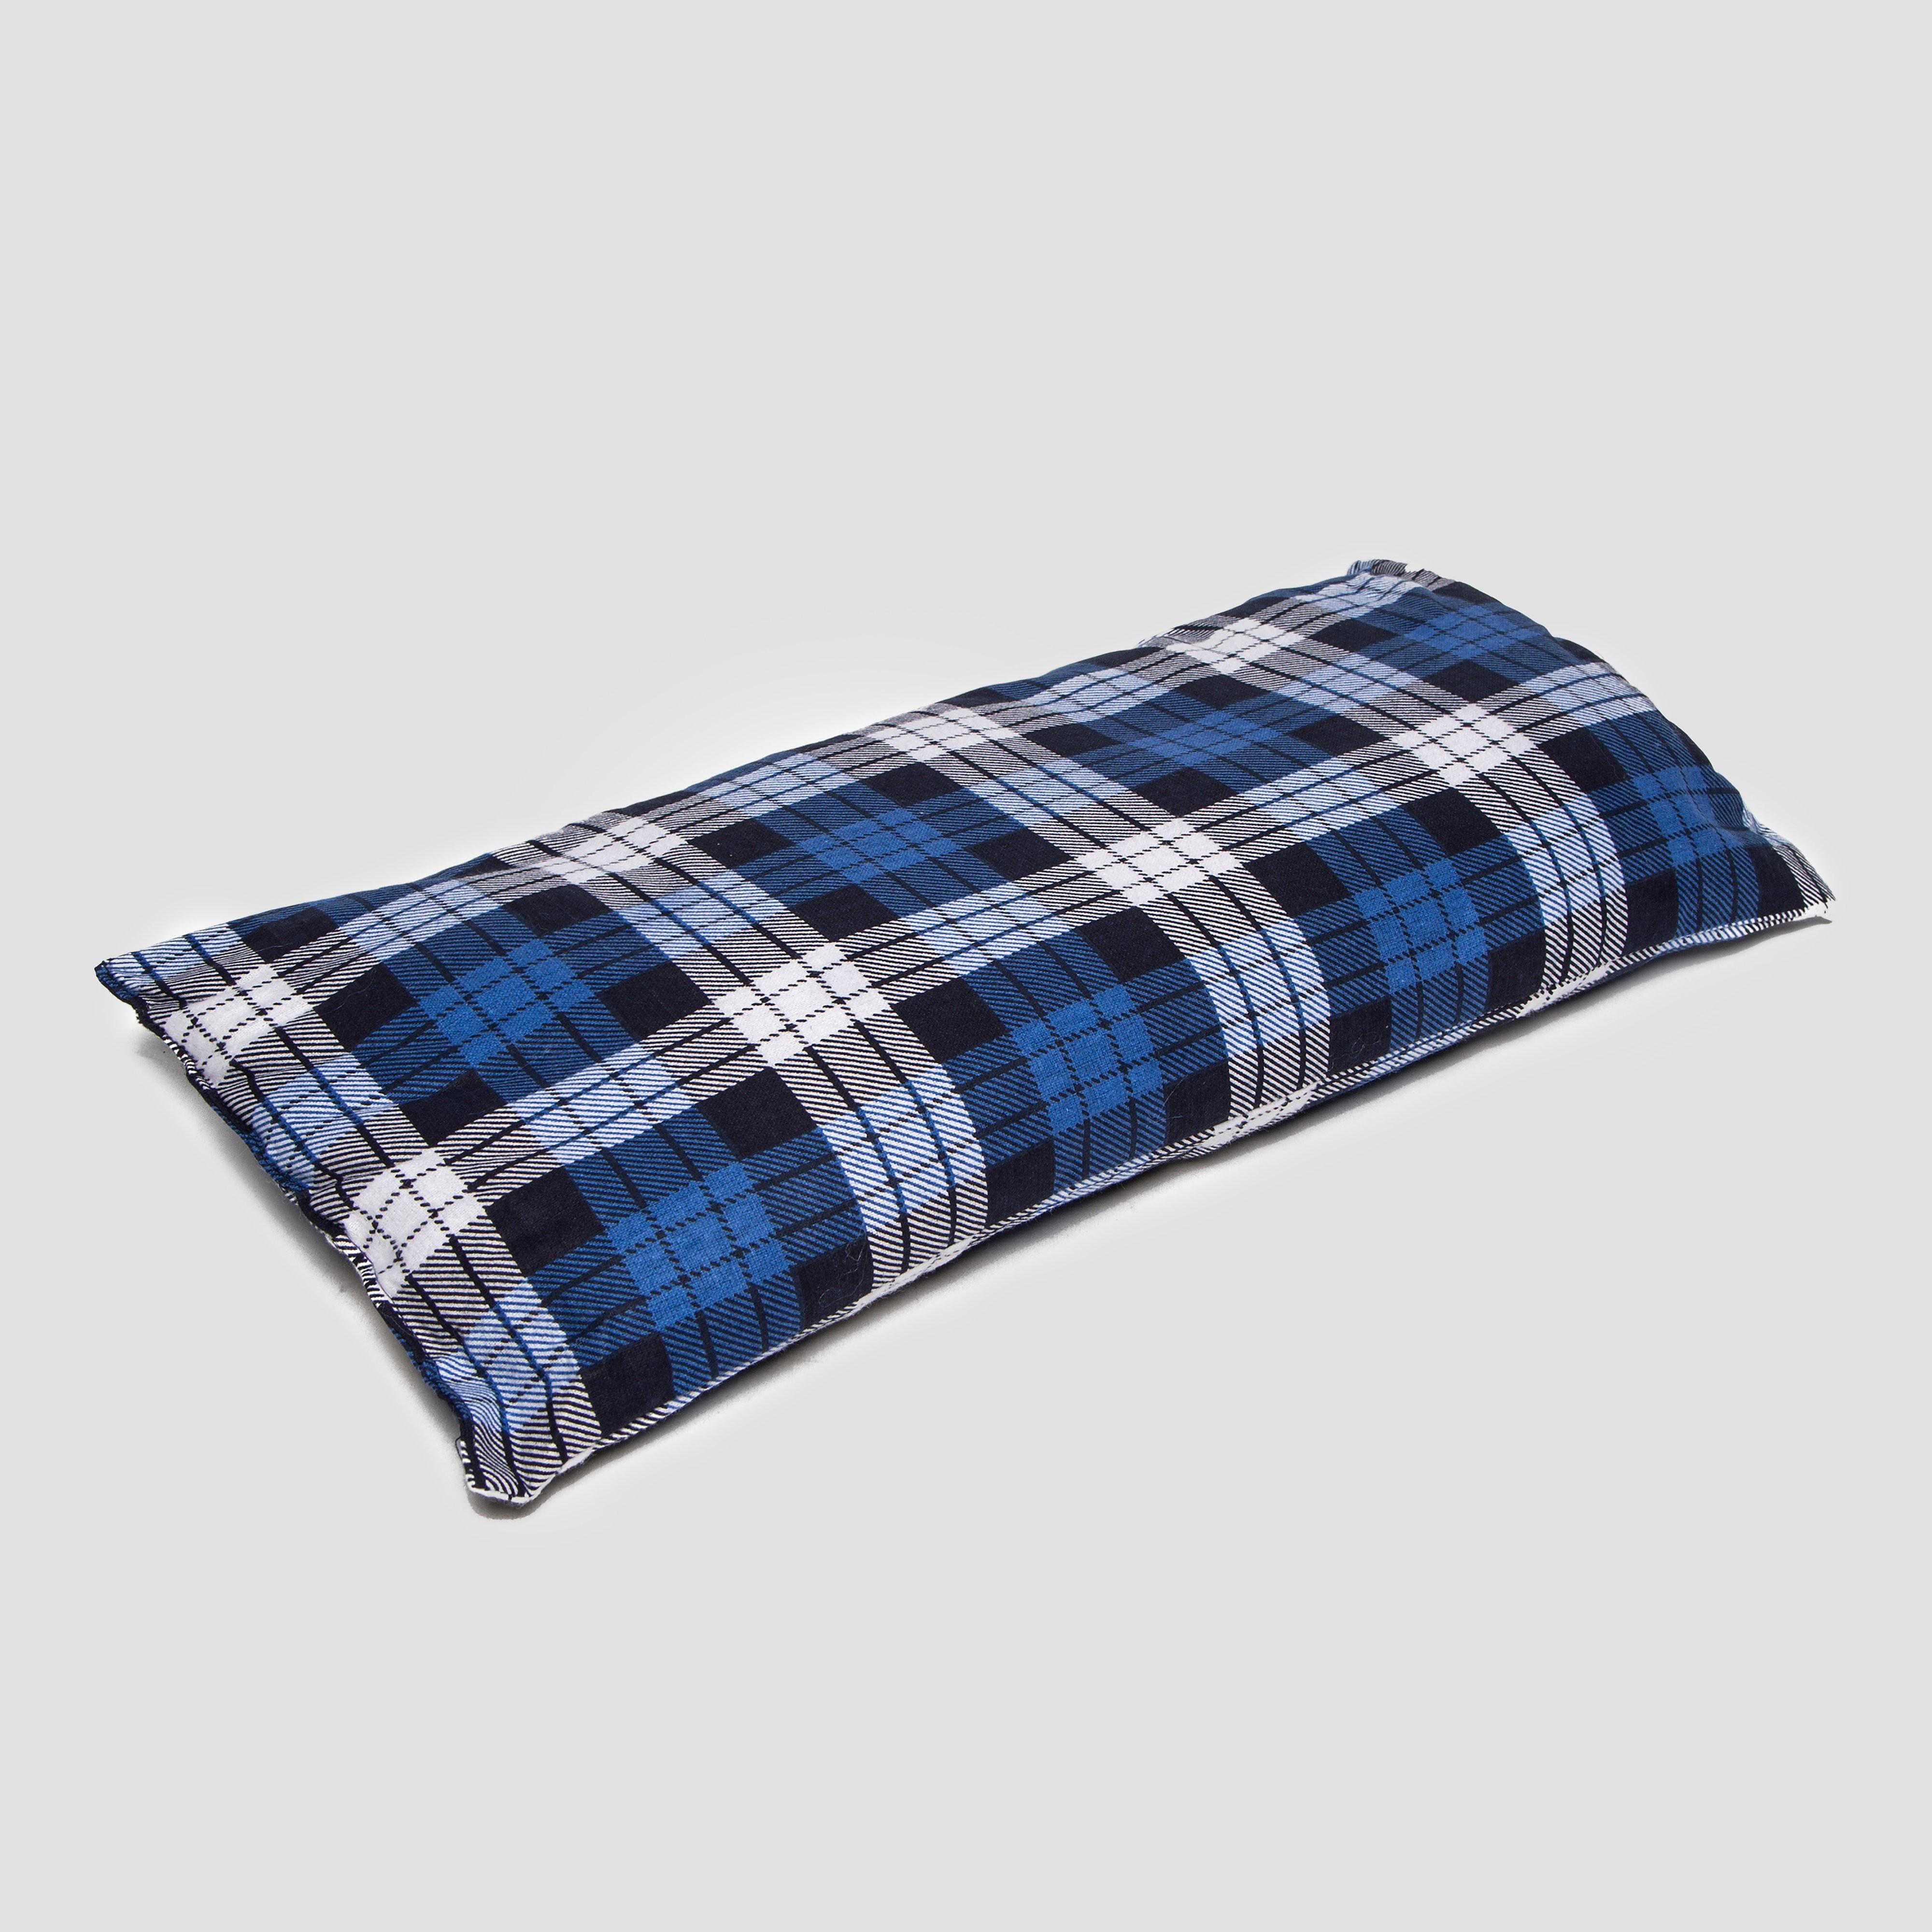 Eurohike Flannel Pillow